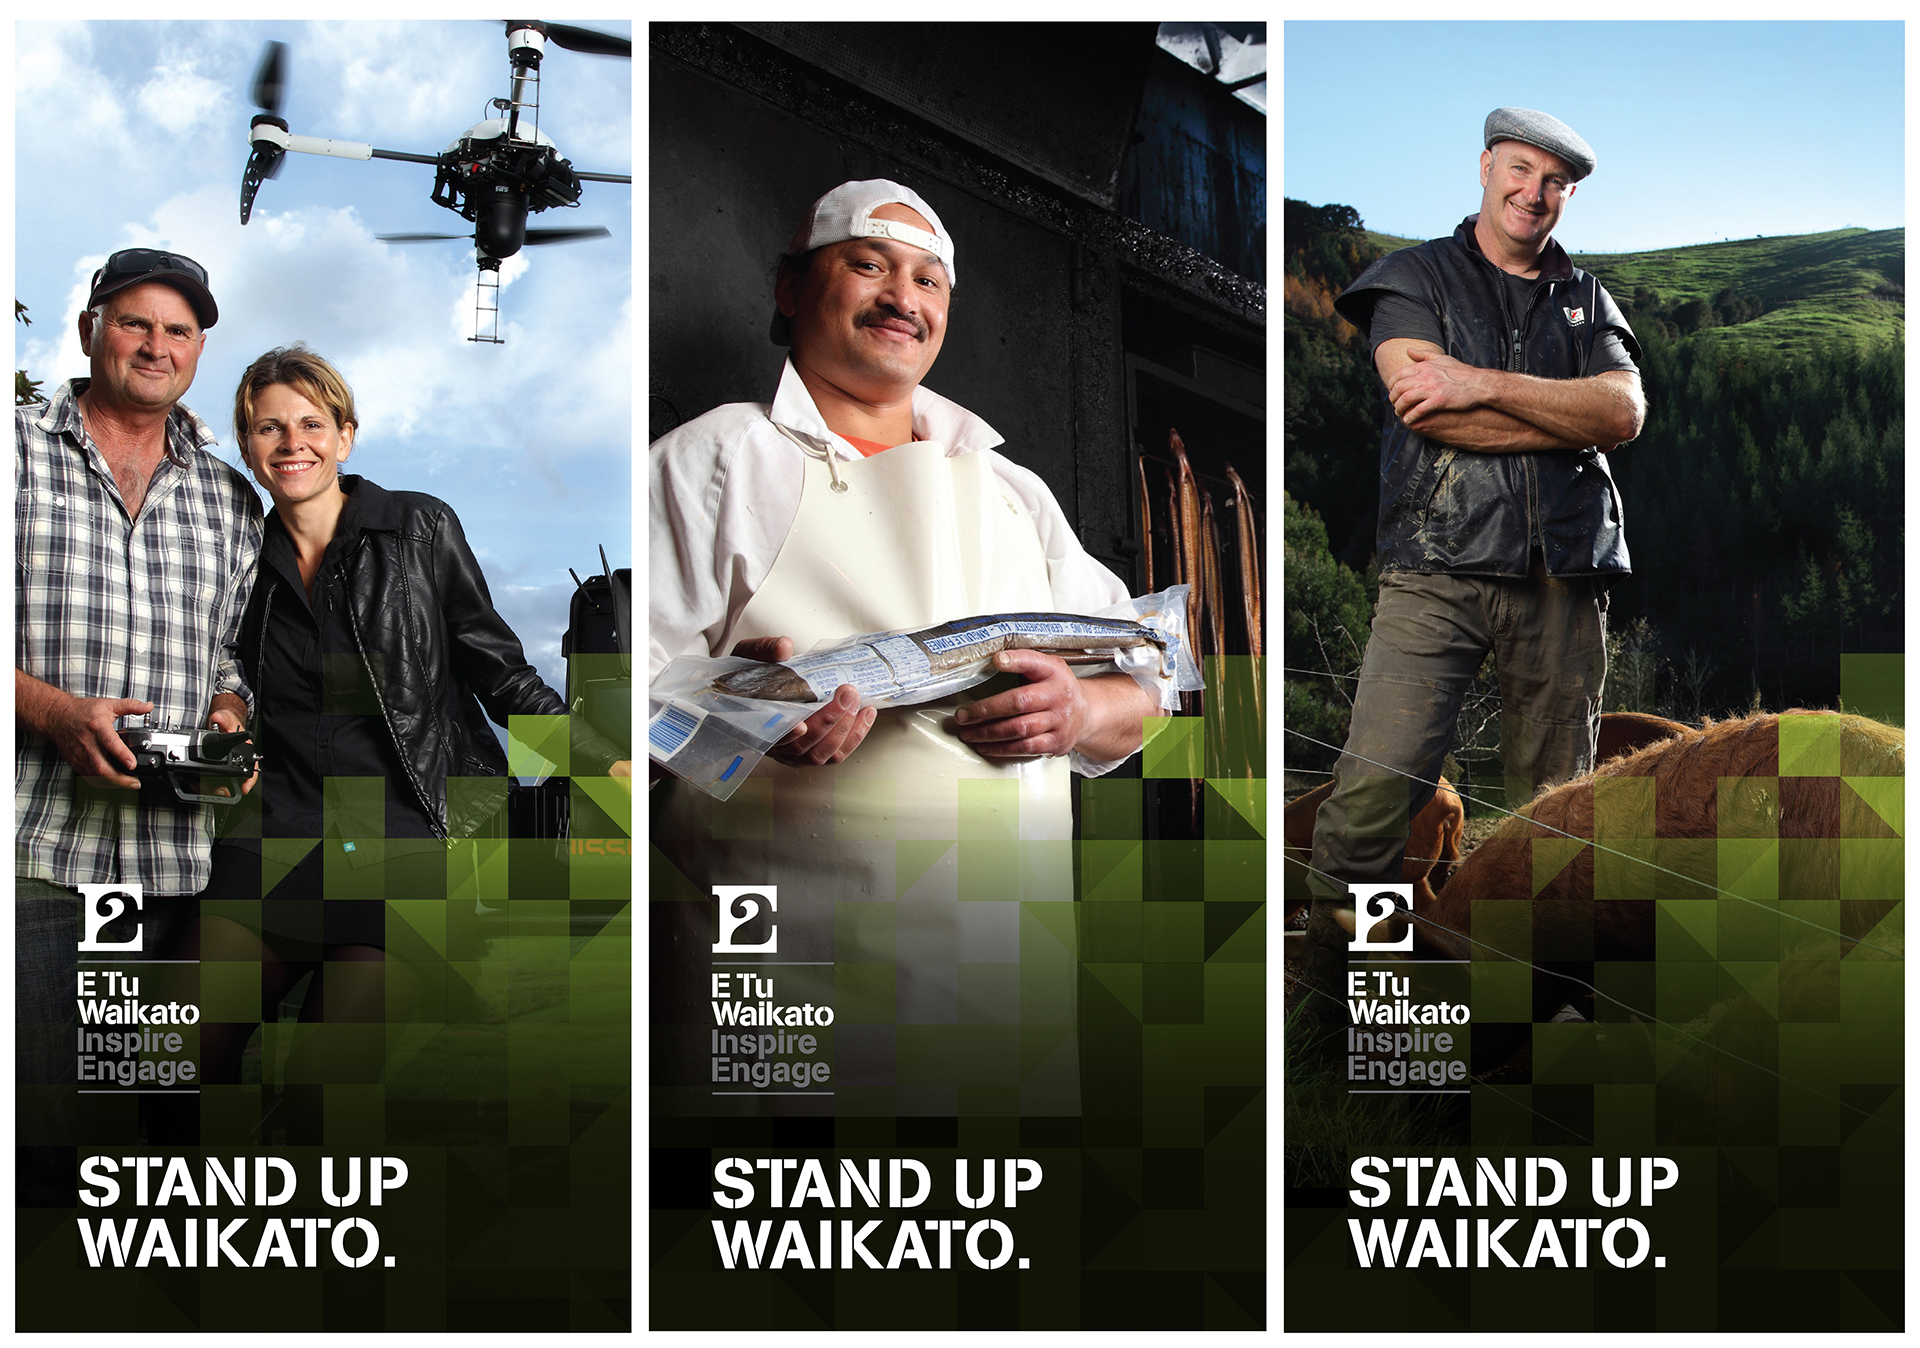 E Tu Open Waikato